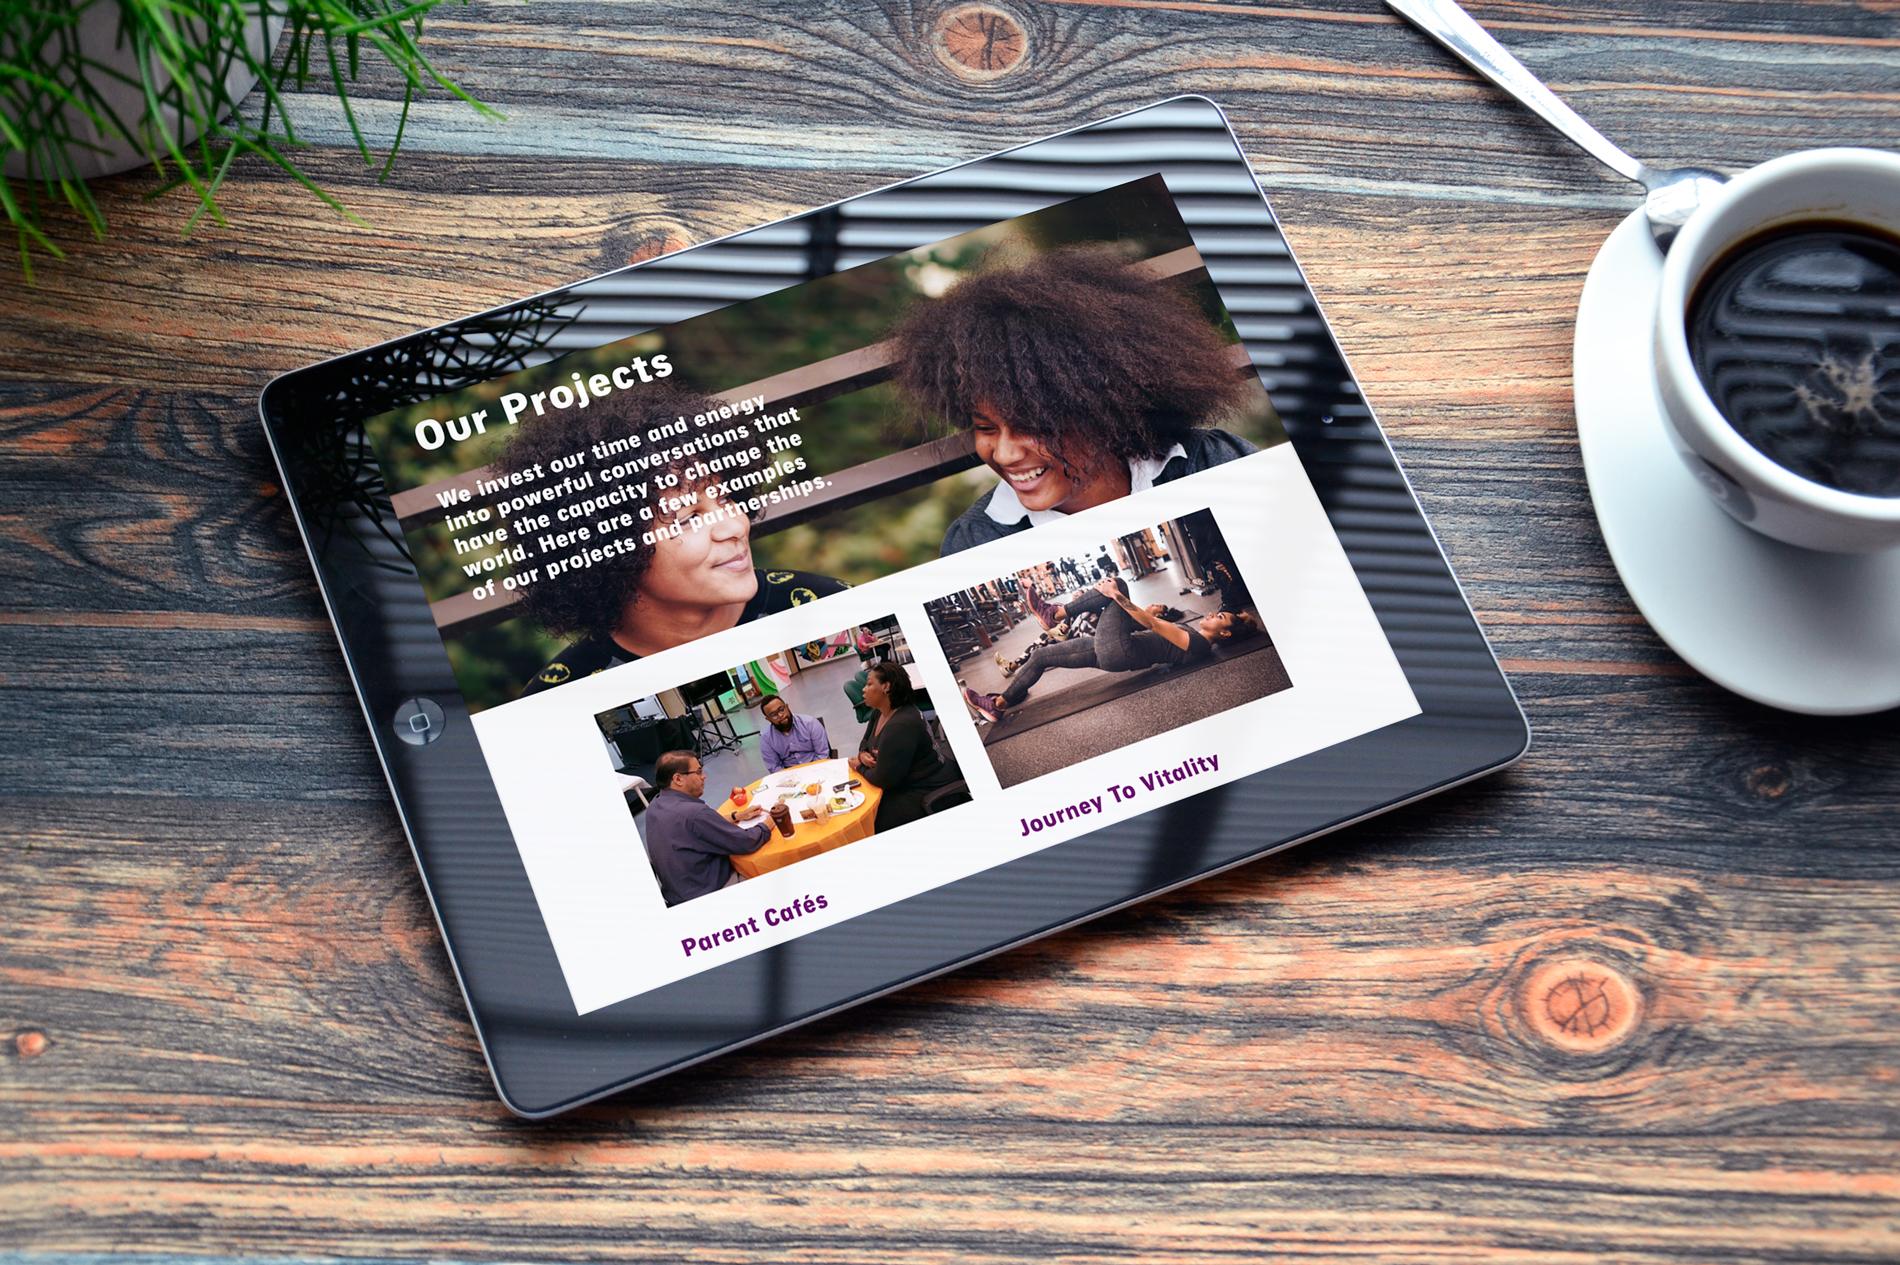 BSF_Website_Tablet1.jpg